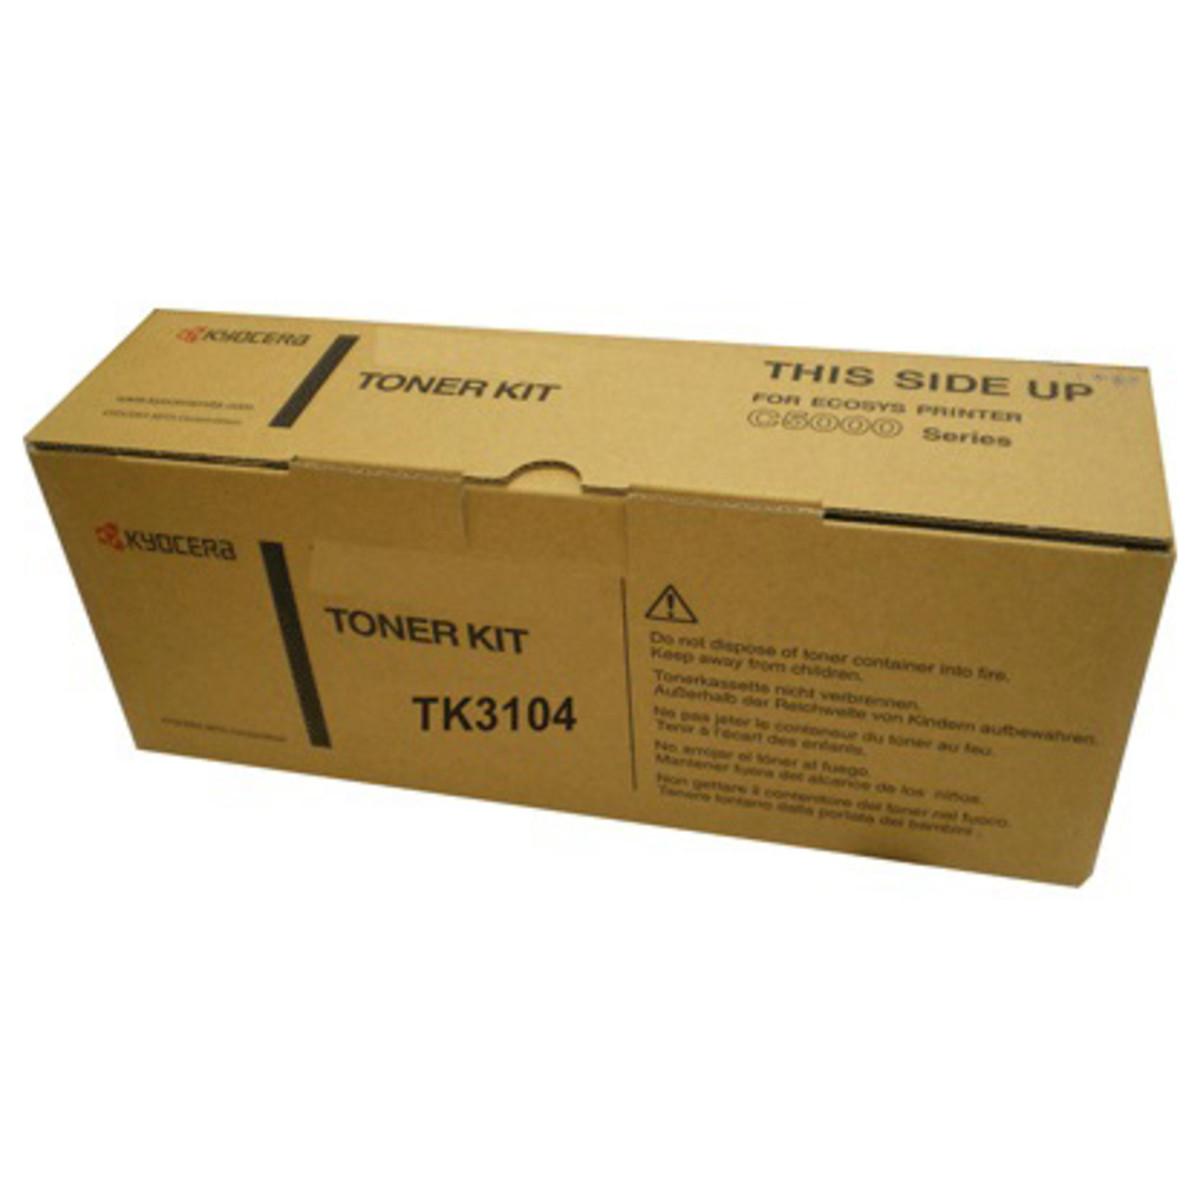 Kyocera TK-3104 Black Toner Cartridge